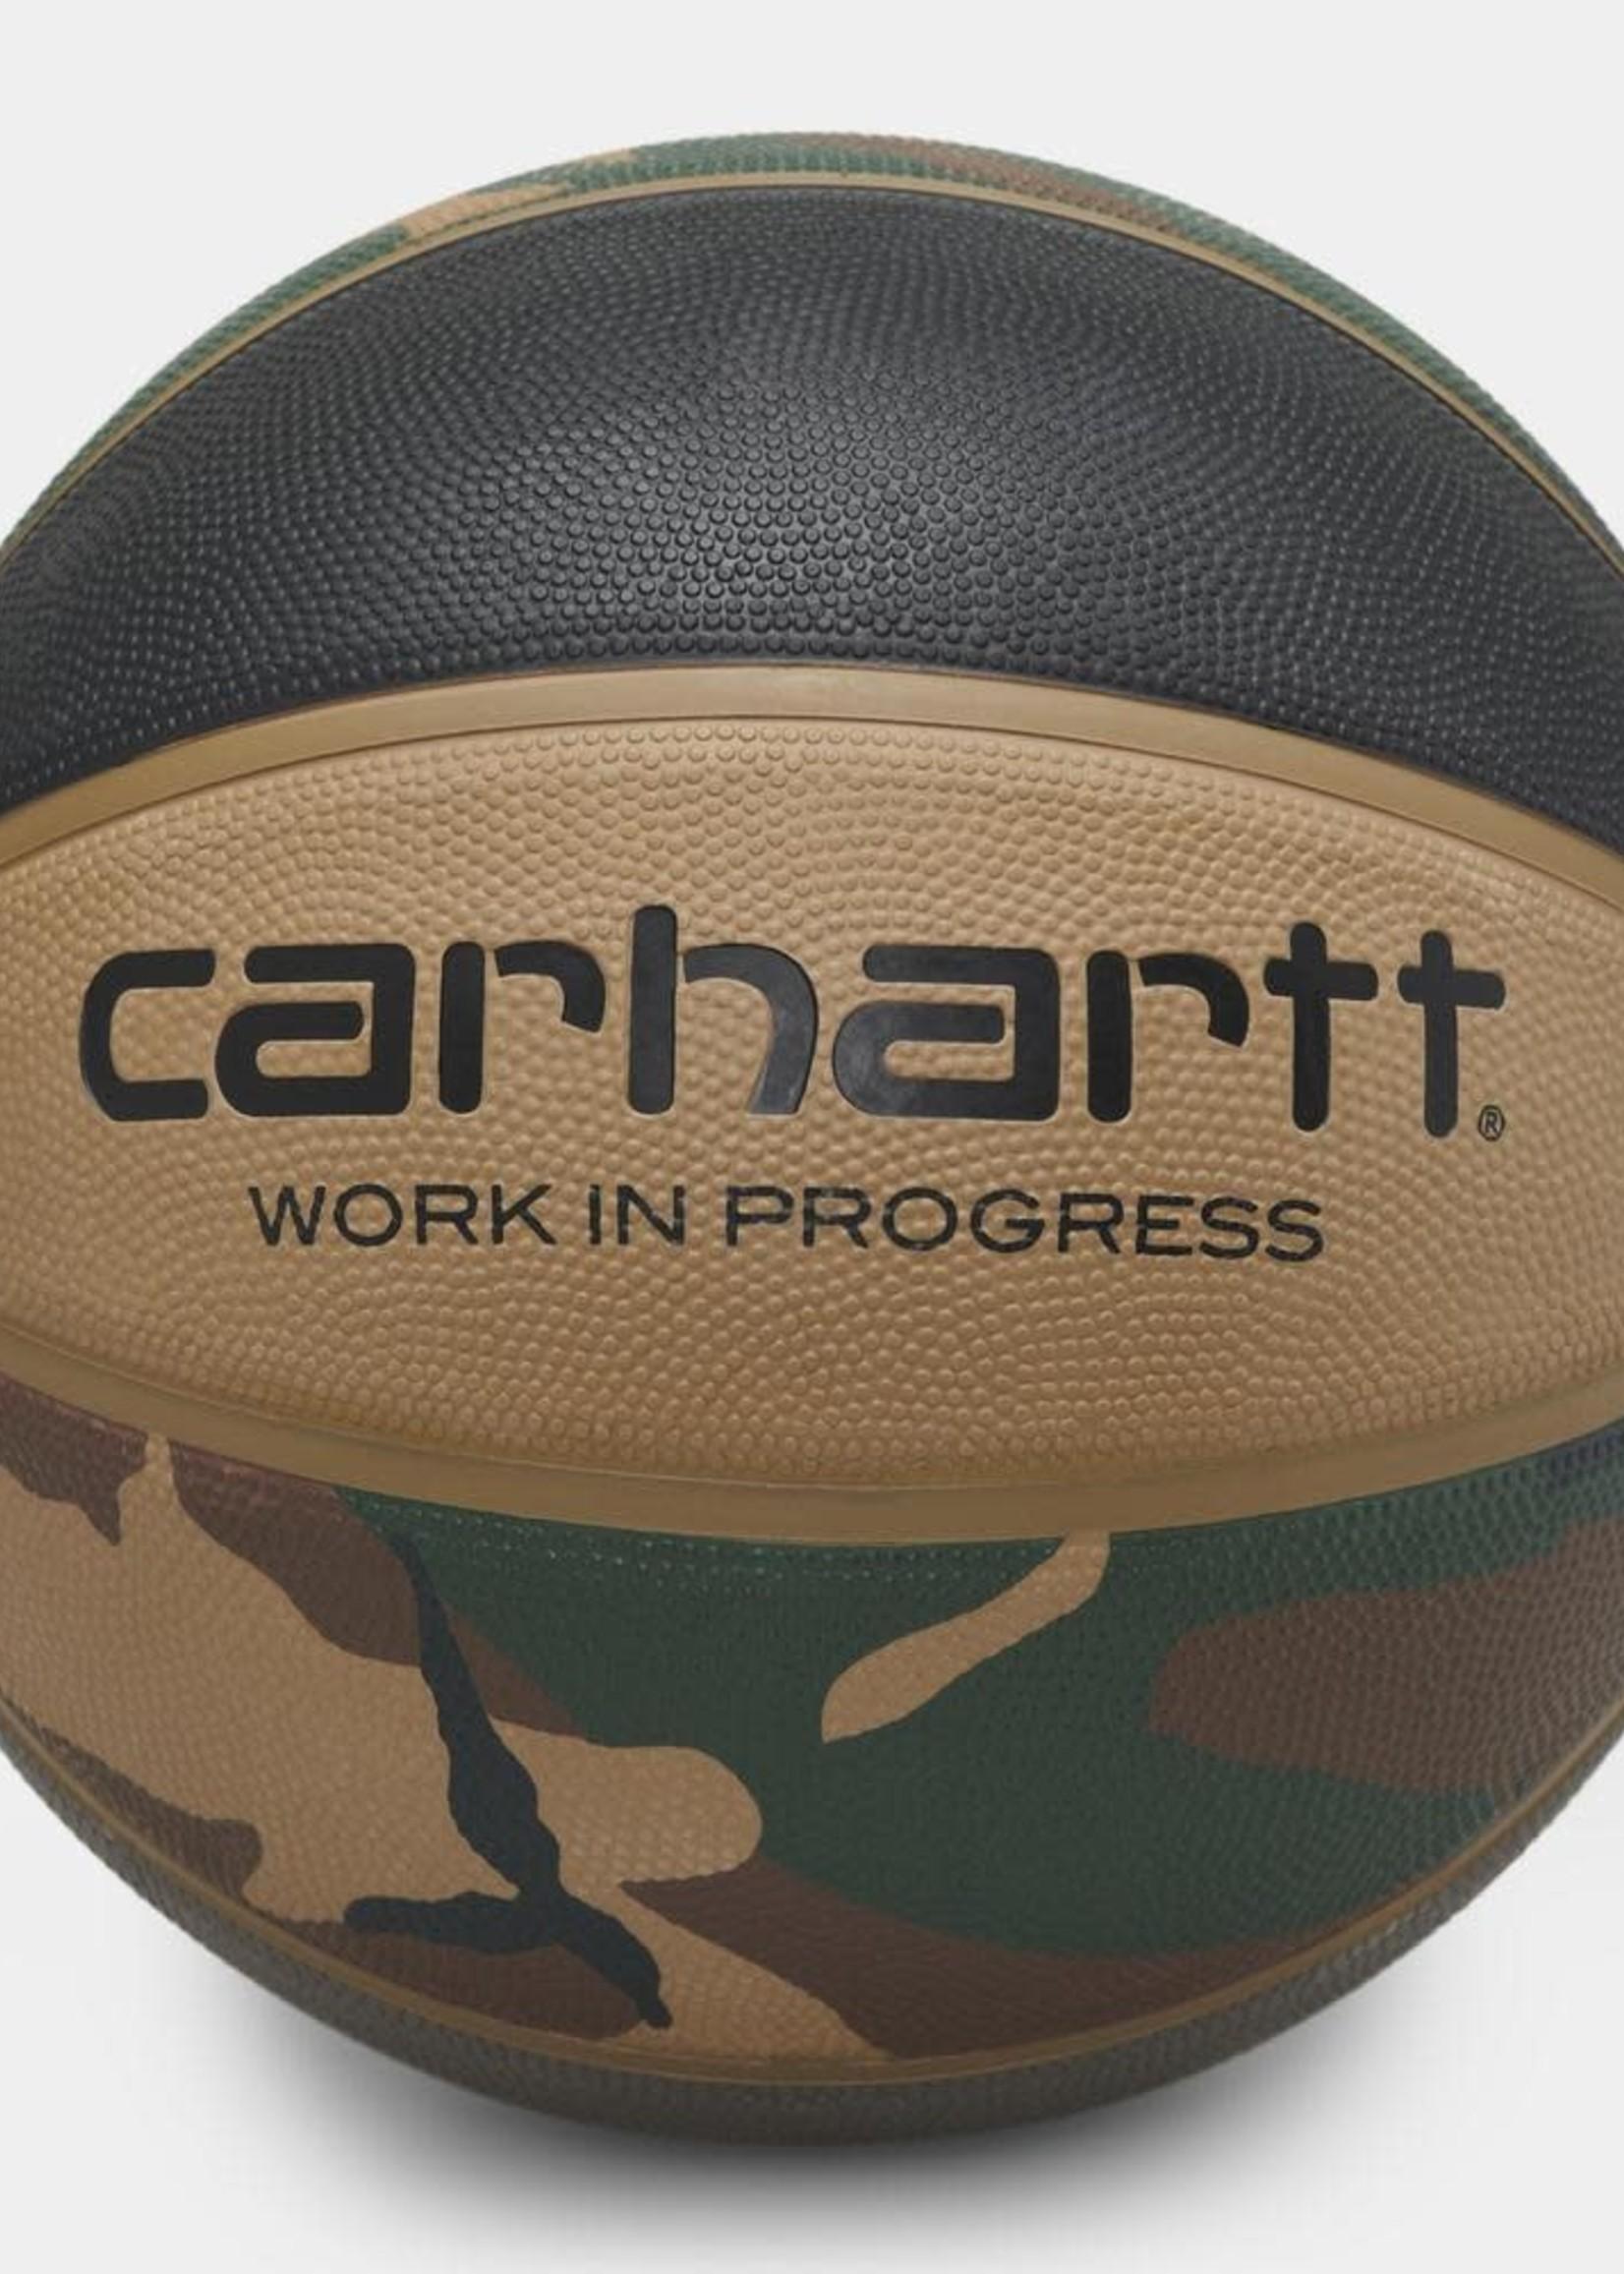 Carhartt Work In Progress Logo Spalding Basketball